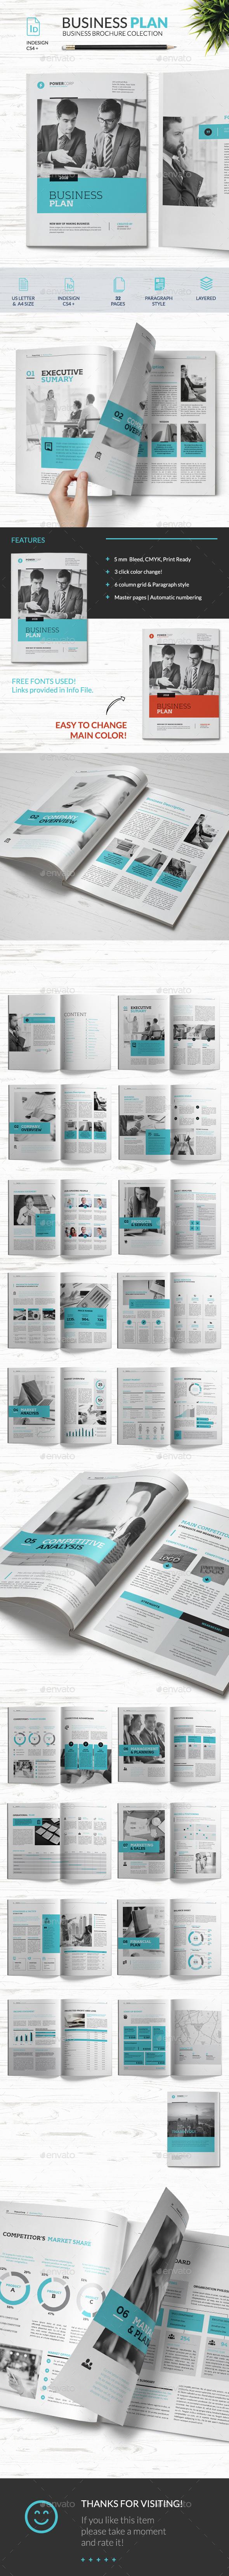 GraphicRiver Business Plan 20391932